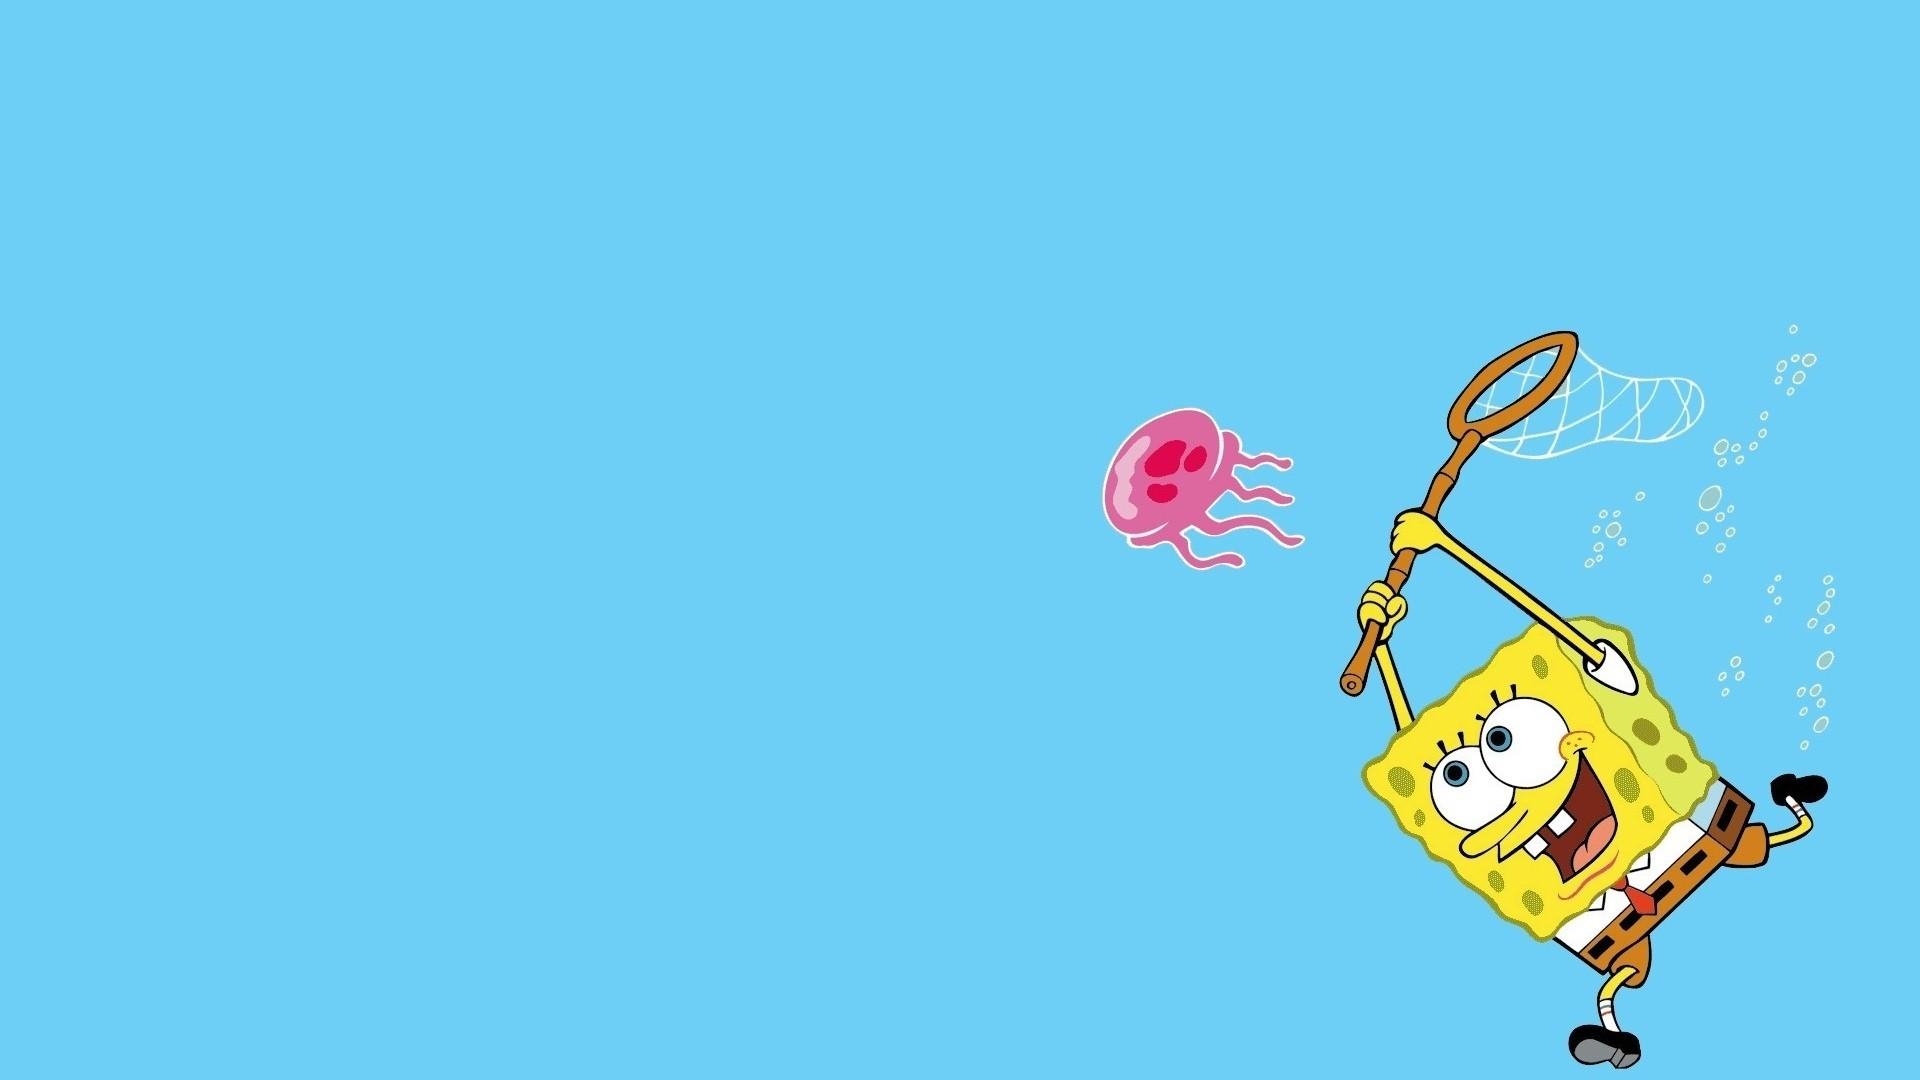 Aesthetic Spongebob High Quality